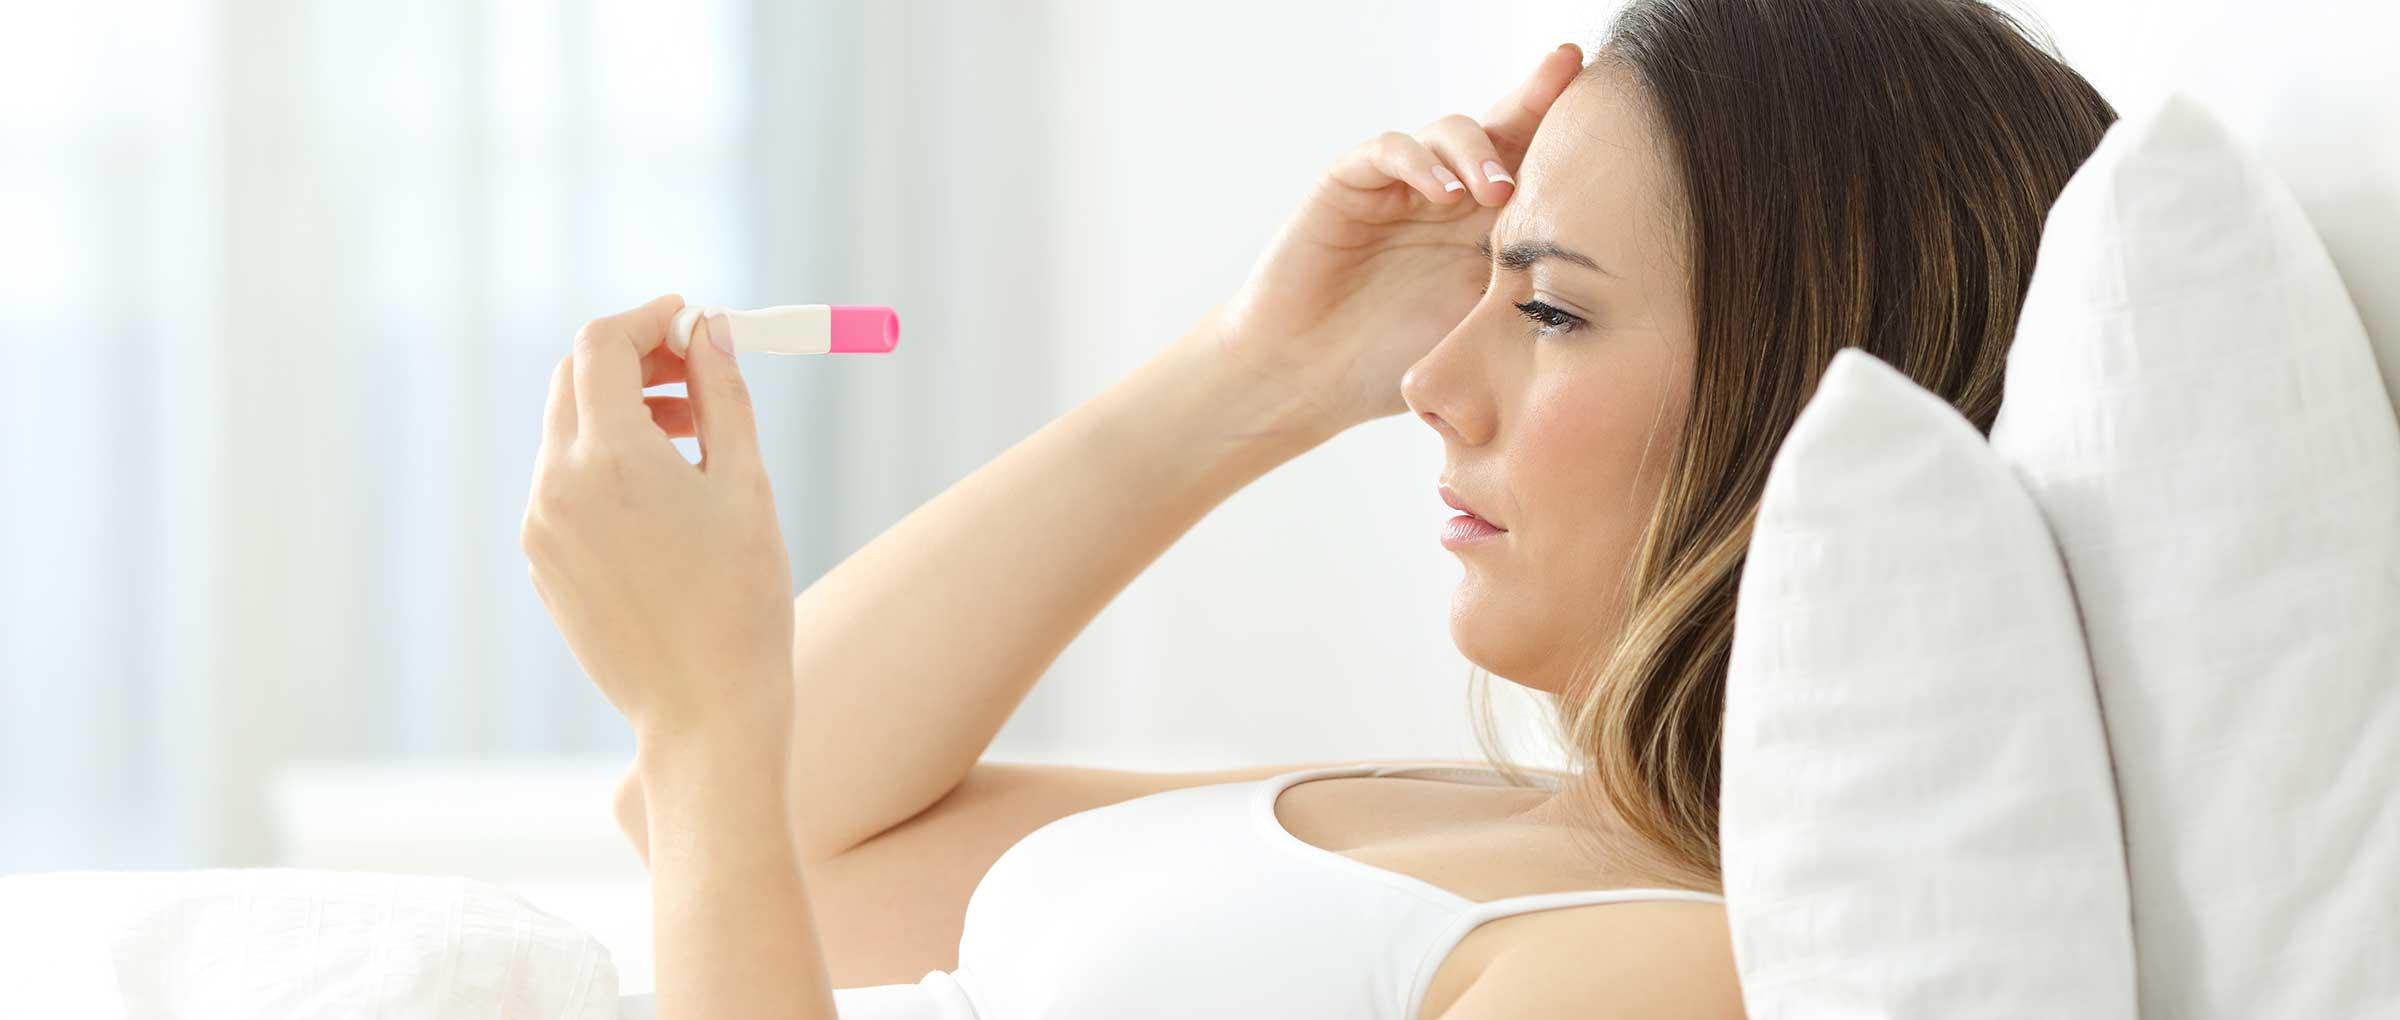 What causes a false negative pregnancy test?